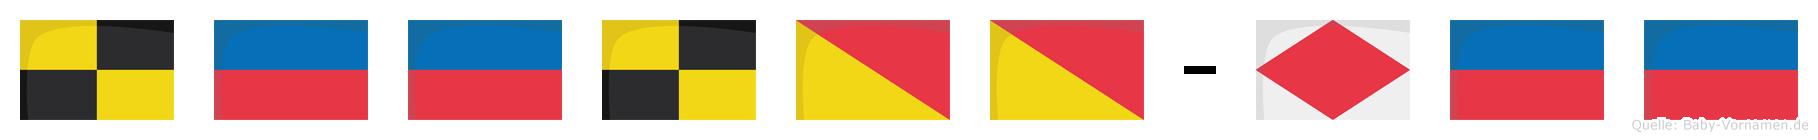 Leeloo-Fee im Flaggenalphabet